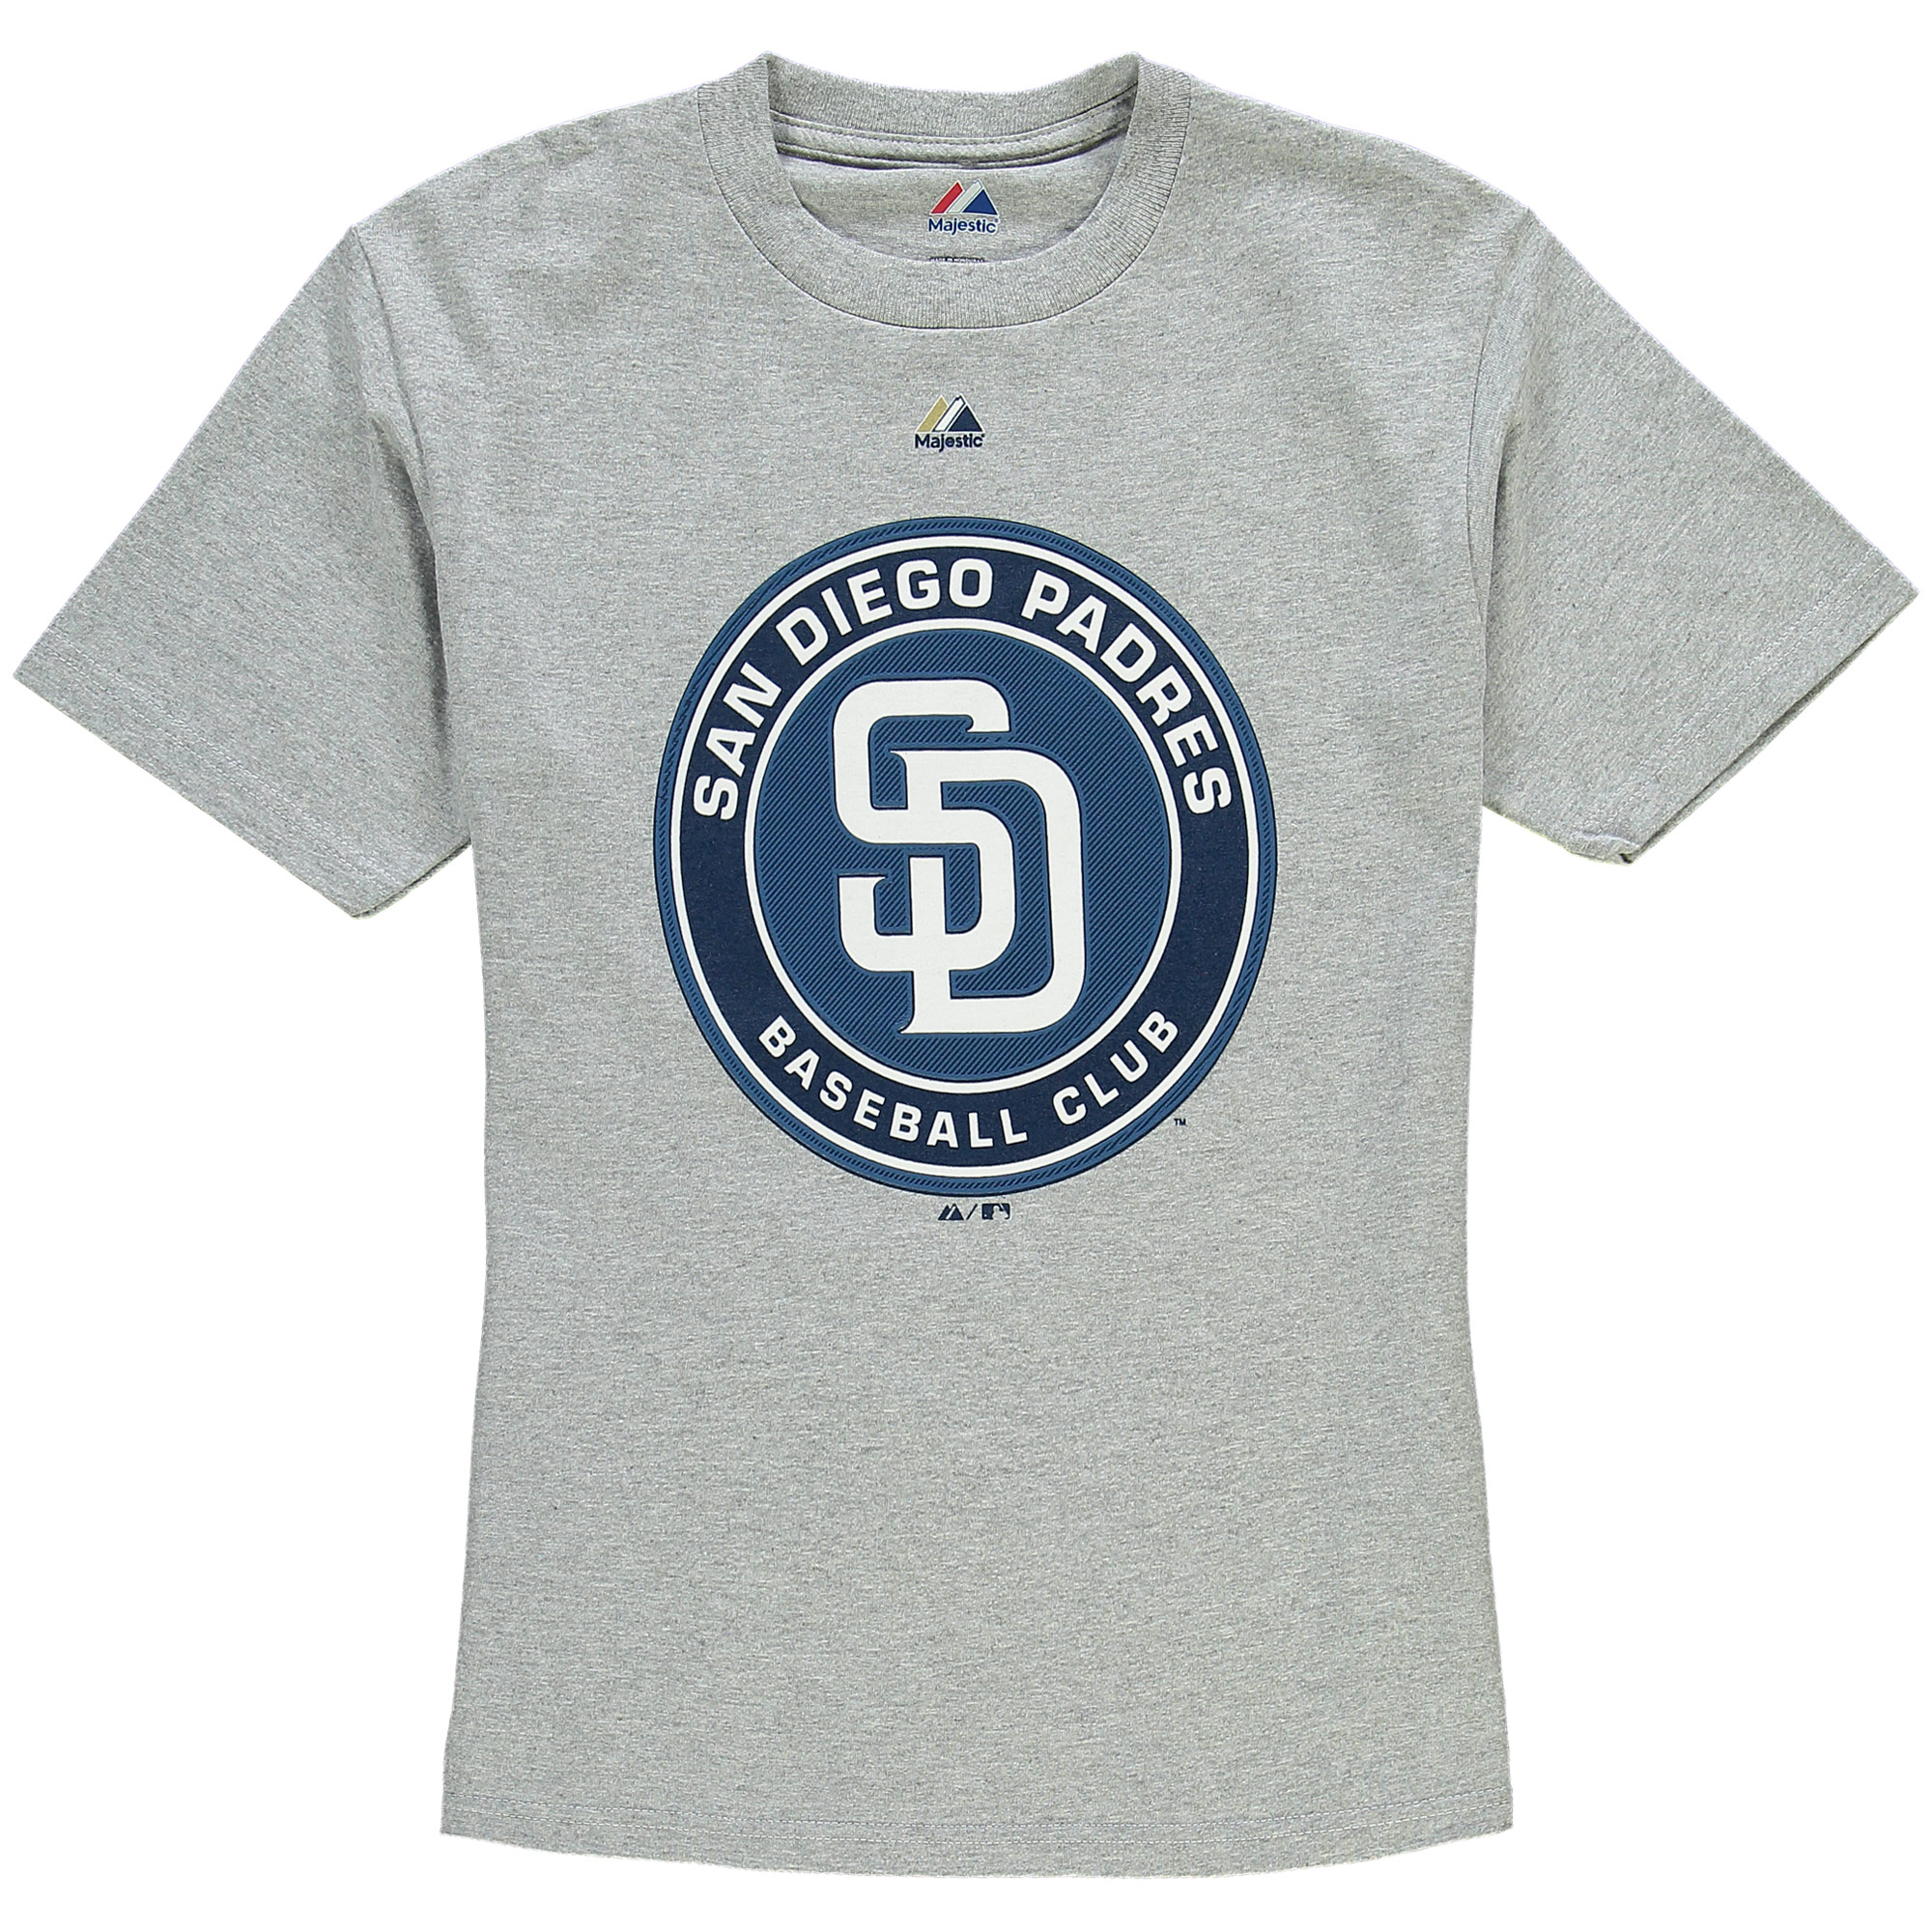 San Diego Padres Majestic Youth Soft Density Logo T-Shirt - Heathered Grey